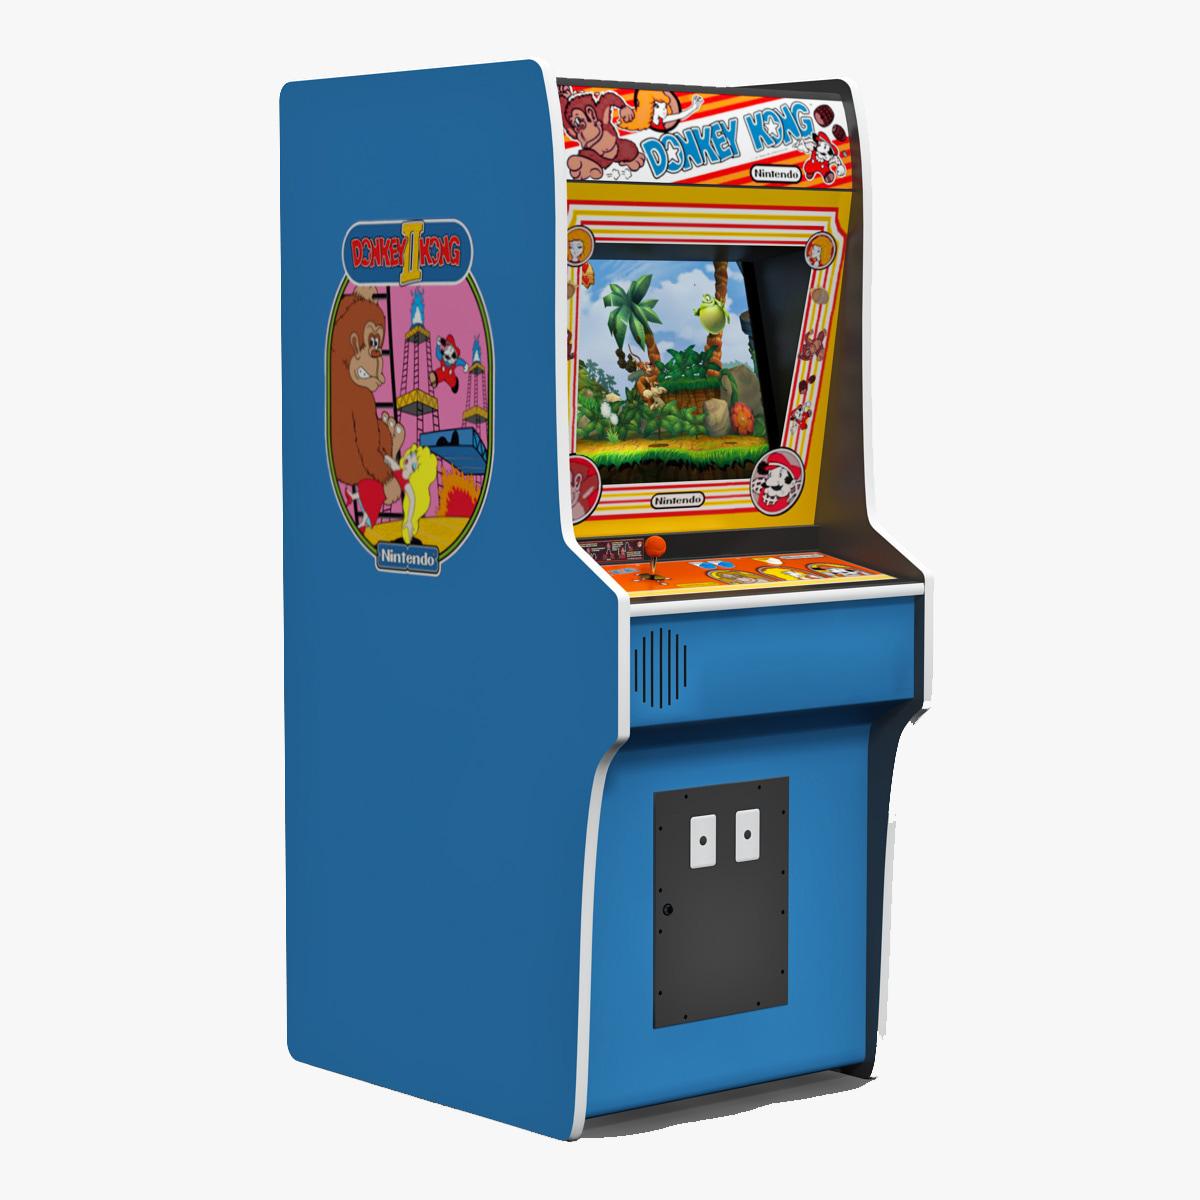 Arcade_Game_Donkey_Kong_00.jpg